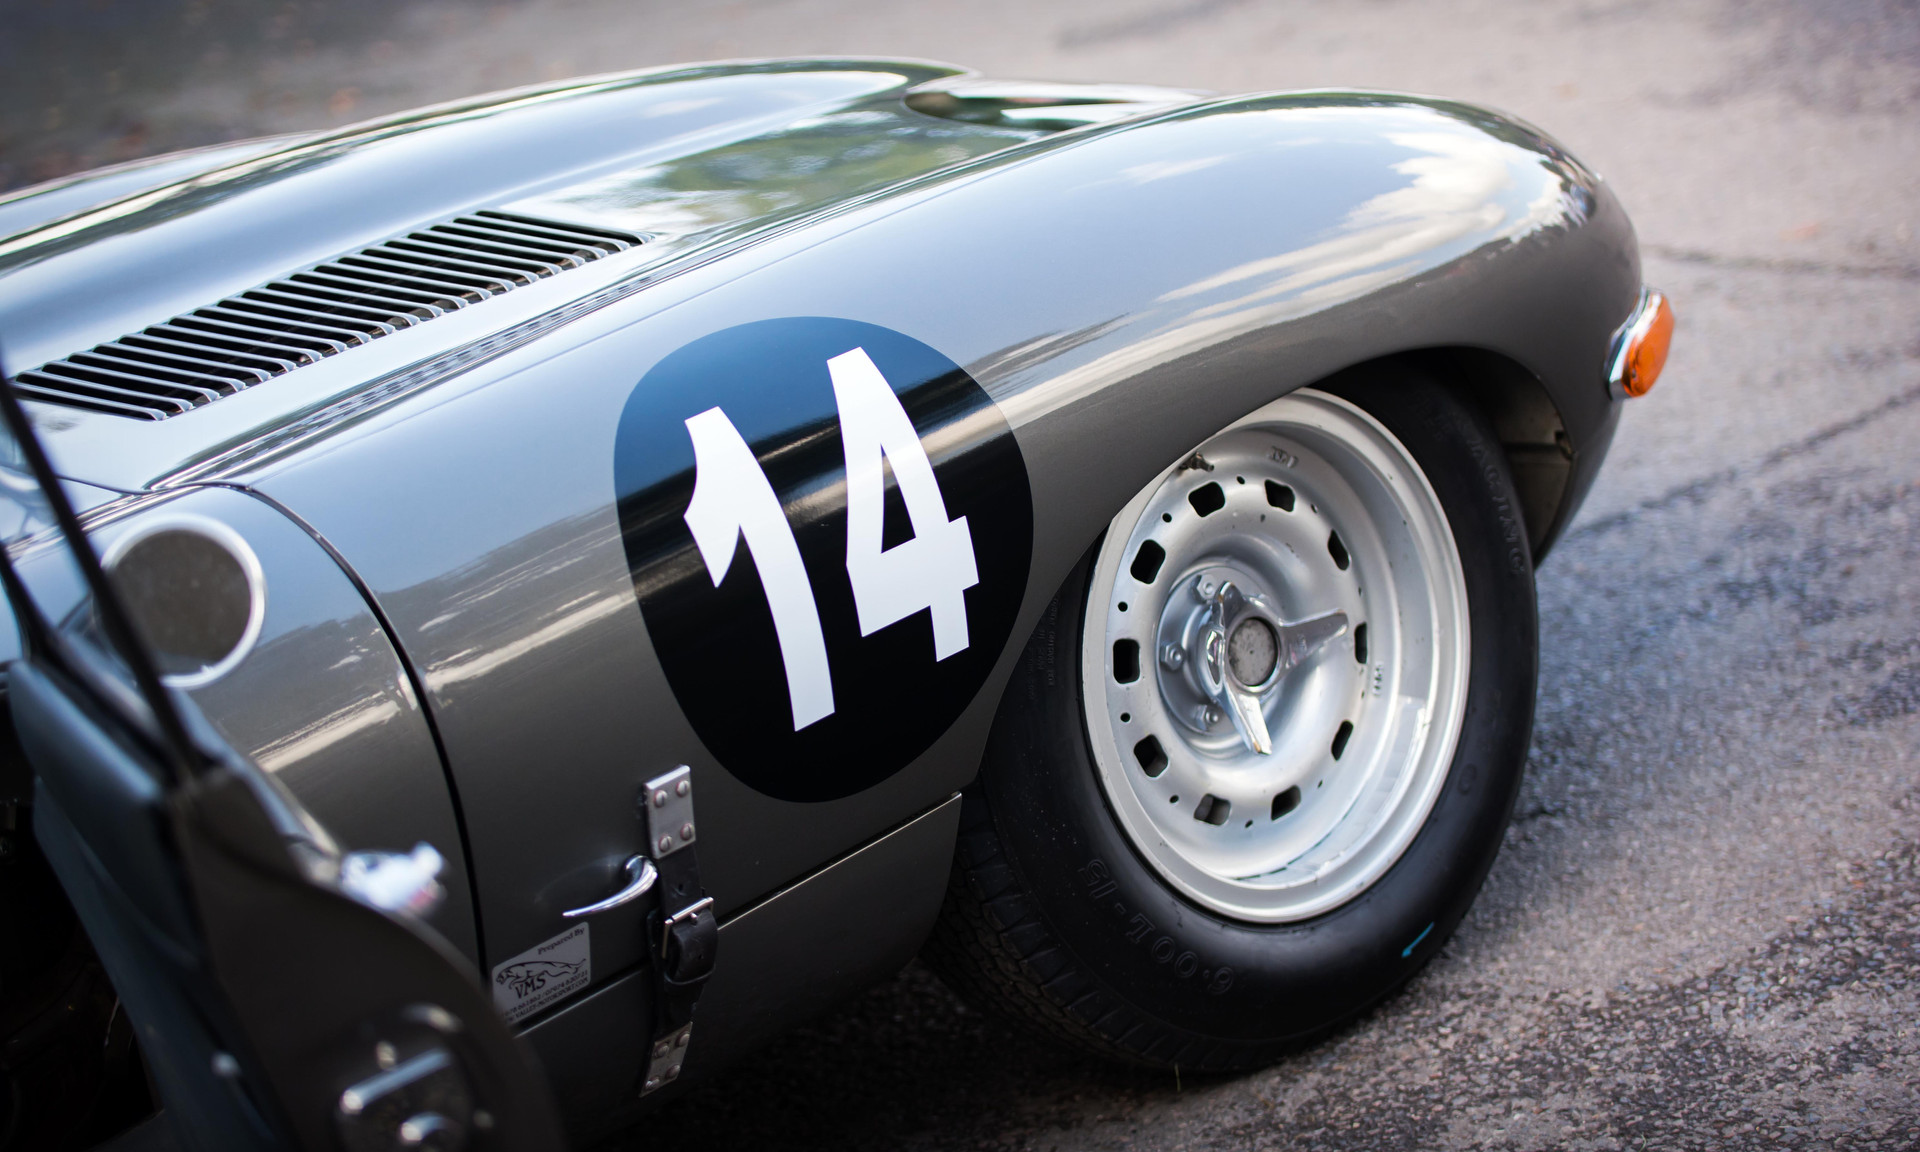 Richard Meins & Rob Huff's 1961Jaguar E-type FHC CUT 7 at the 2017 Goodwood Revival